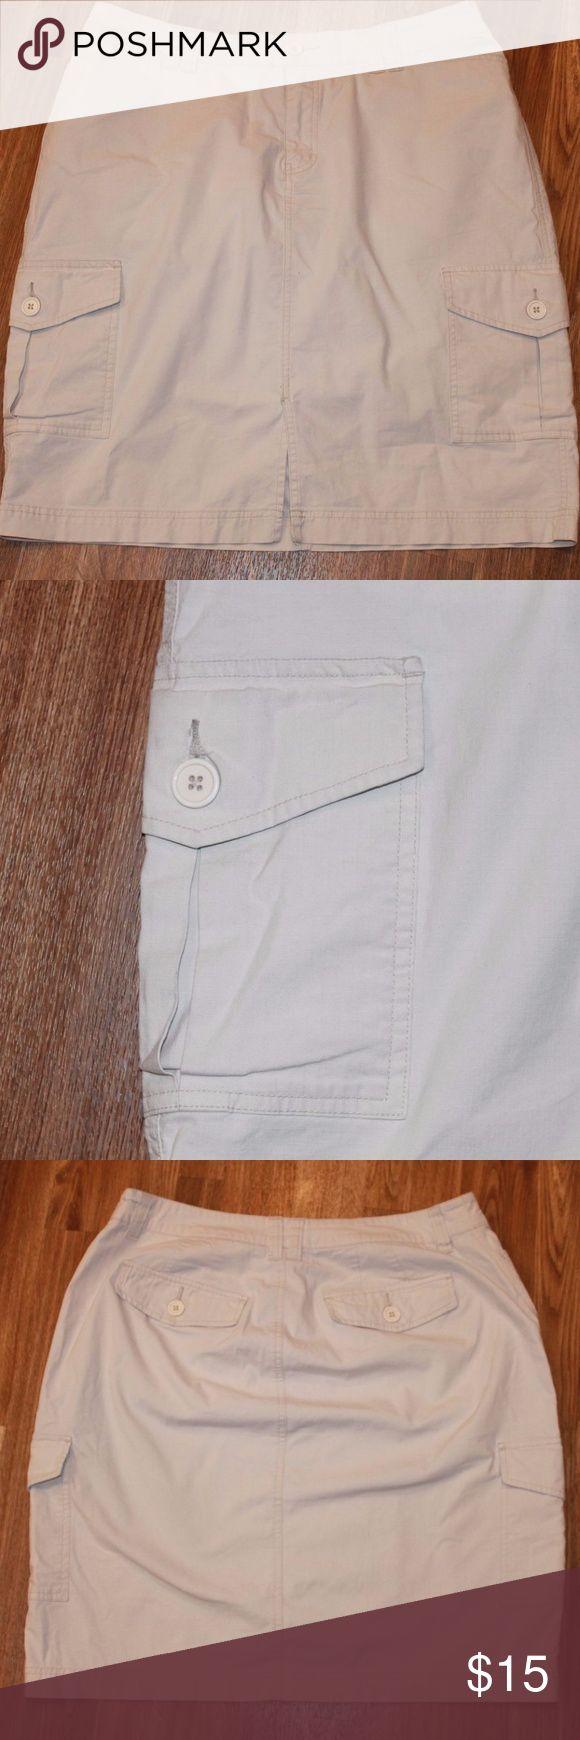 "Venezia Lane Bryant Khaki Pencil Cargo Skirt HW408 Venezia Lane Bryant Khaki Pencil Skirt Plus Size 16  2 Front Pockets 2 Side Cargo Pockets  2 Back Pockets   97% Cotton 3% Spandex   Measurement's are approximate: Waist: 36"" Length: 22"" Lane Bryant Skirts"